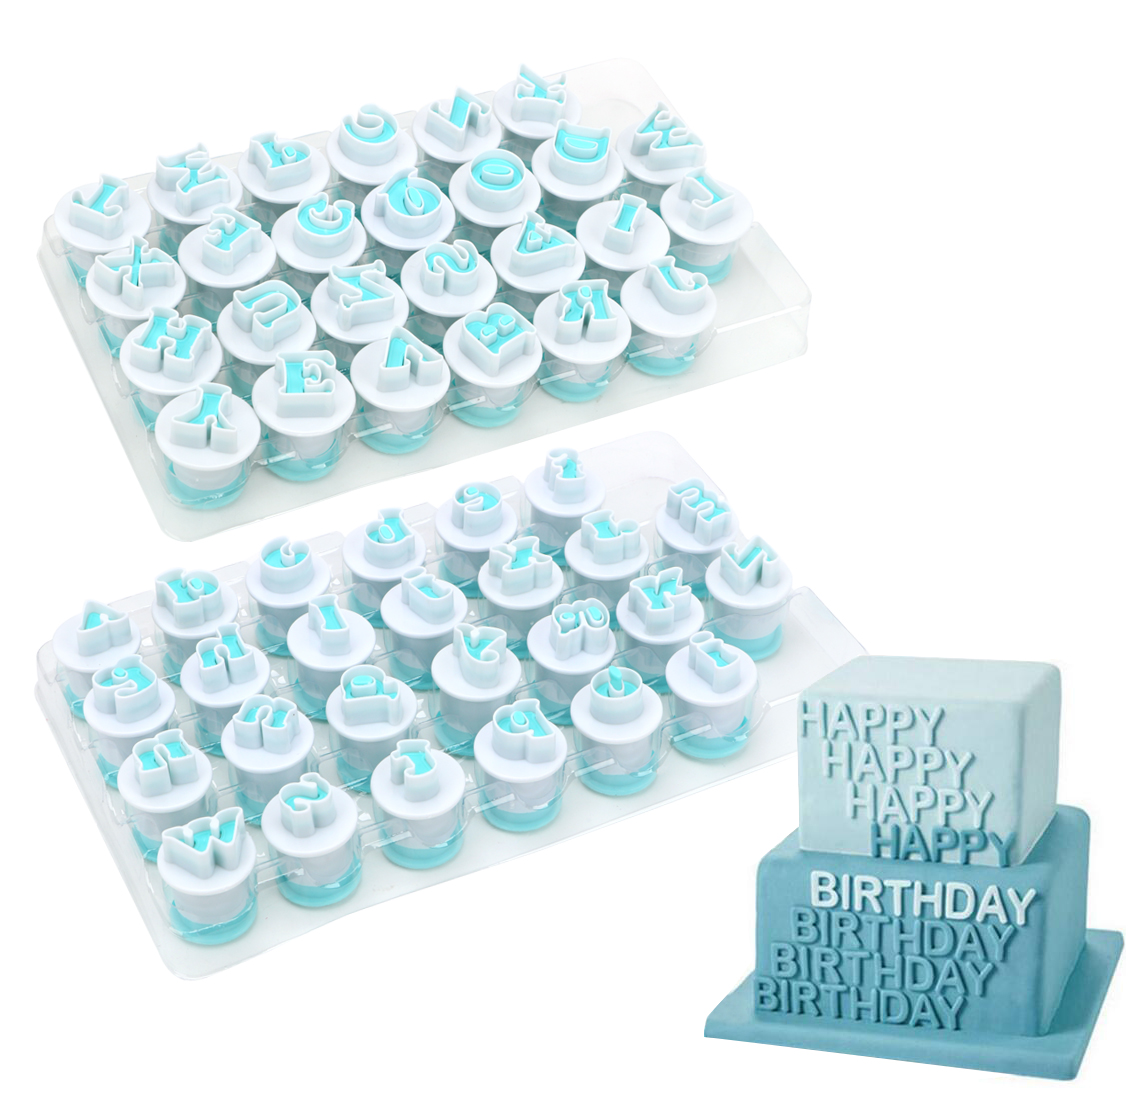 Fondant Cake Alphabet Plunger Set